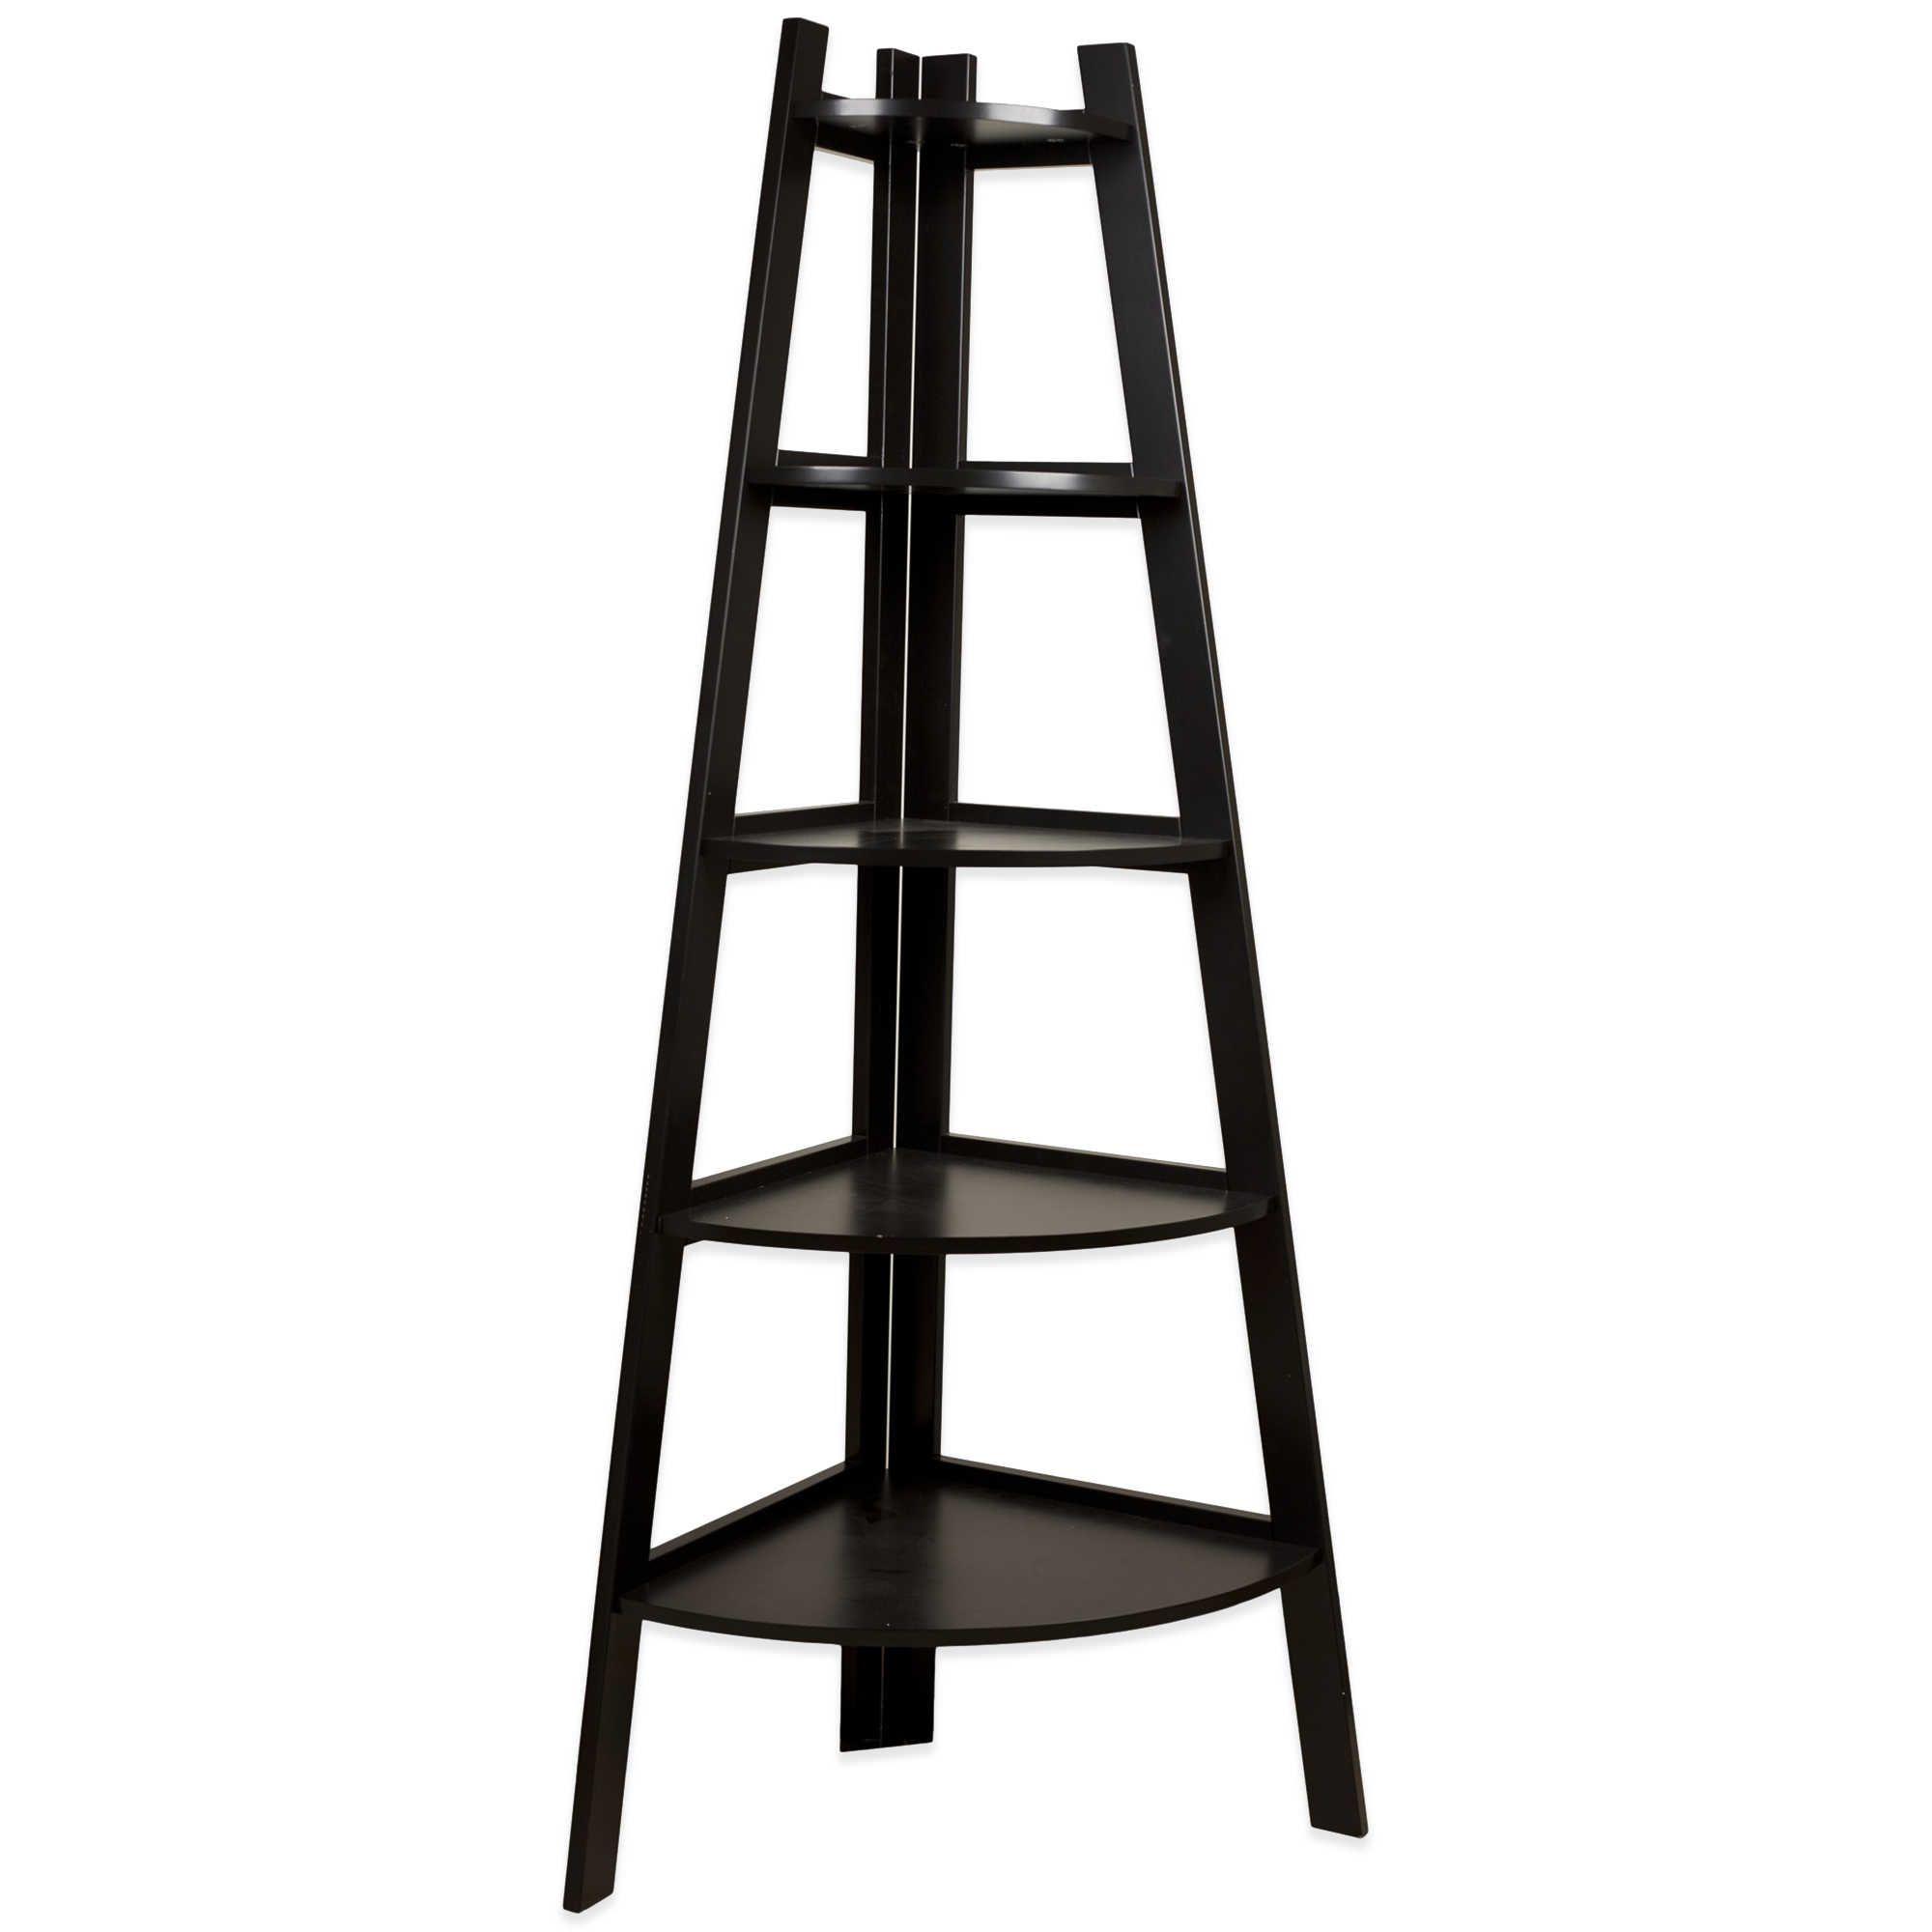 Wood tiered corner ladder bookshelf display in espresso if we ever